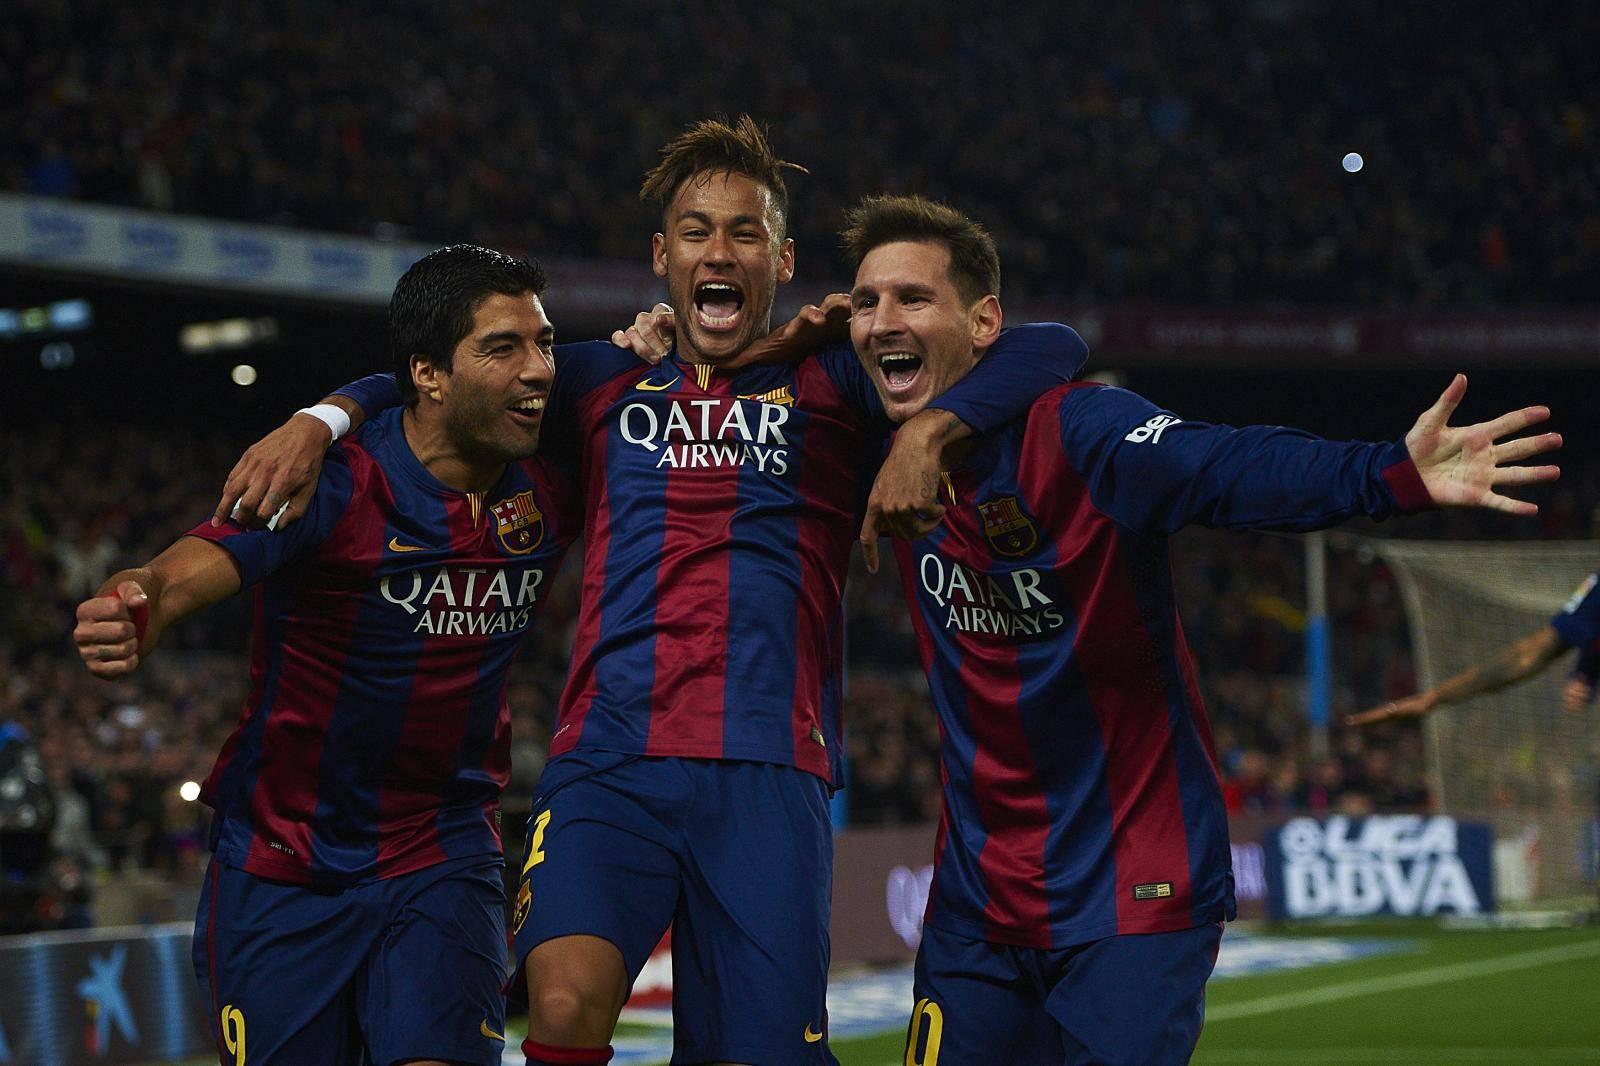 La Liga 2014/2015 - FC Barcelona v Atletico de Madrid